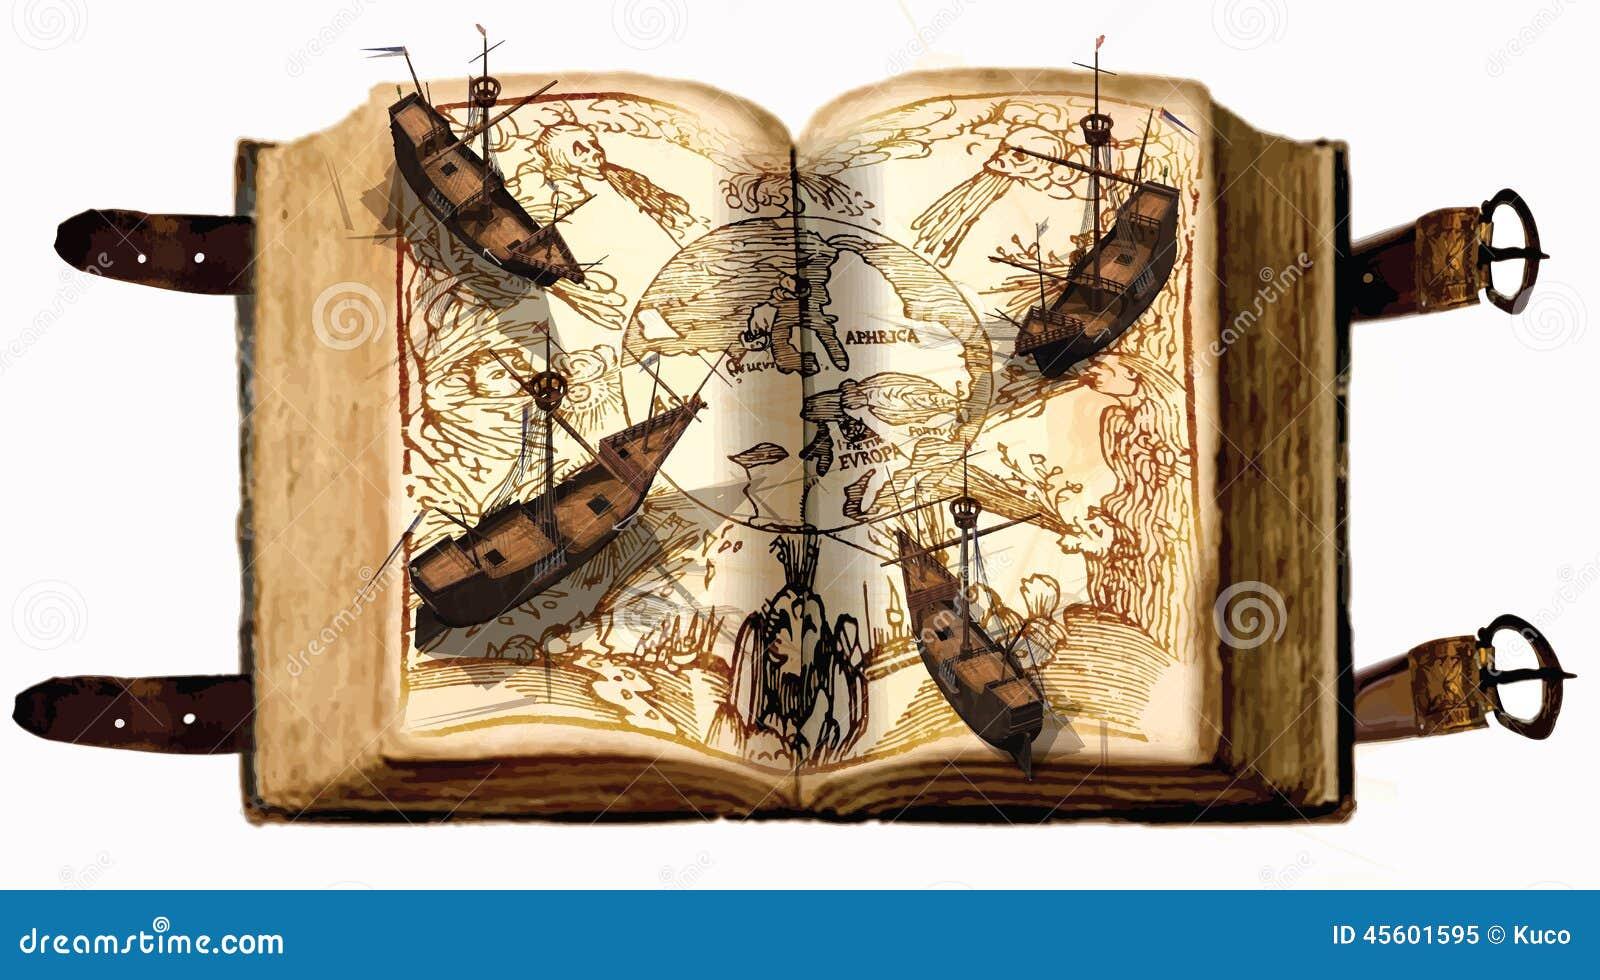 Medieval Time Travel Books